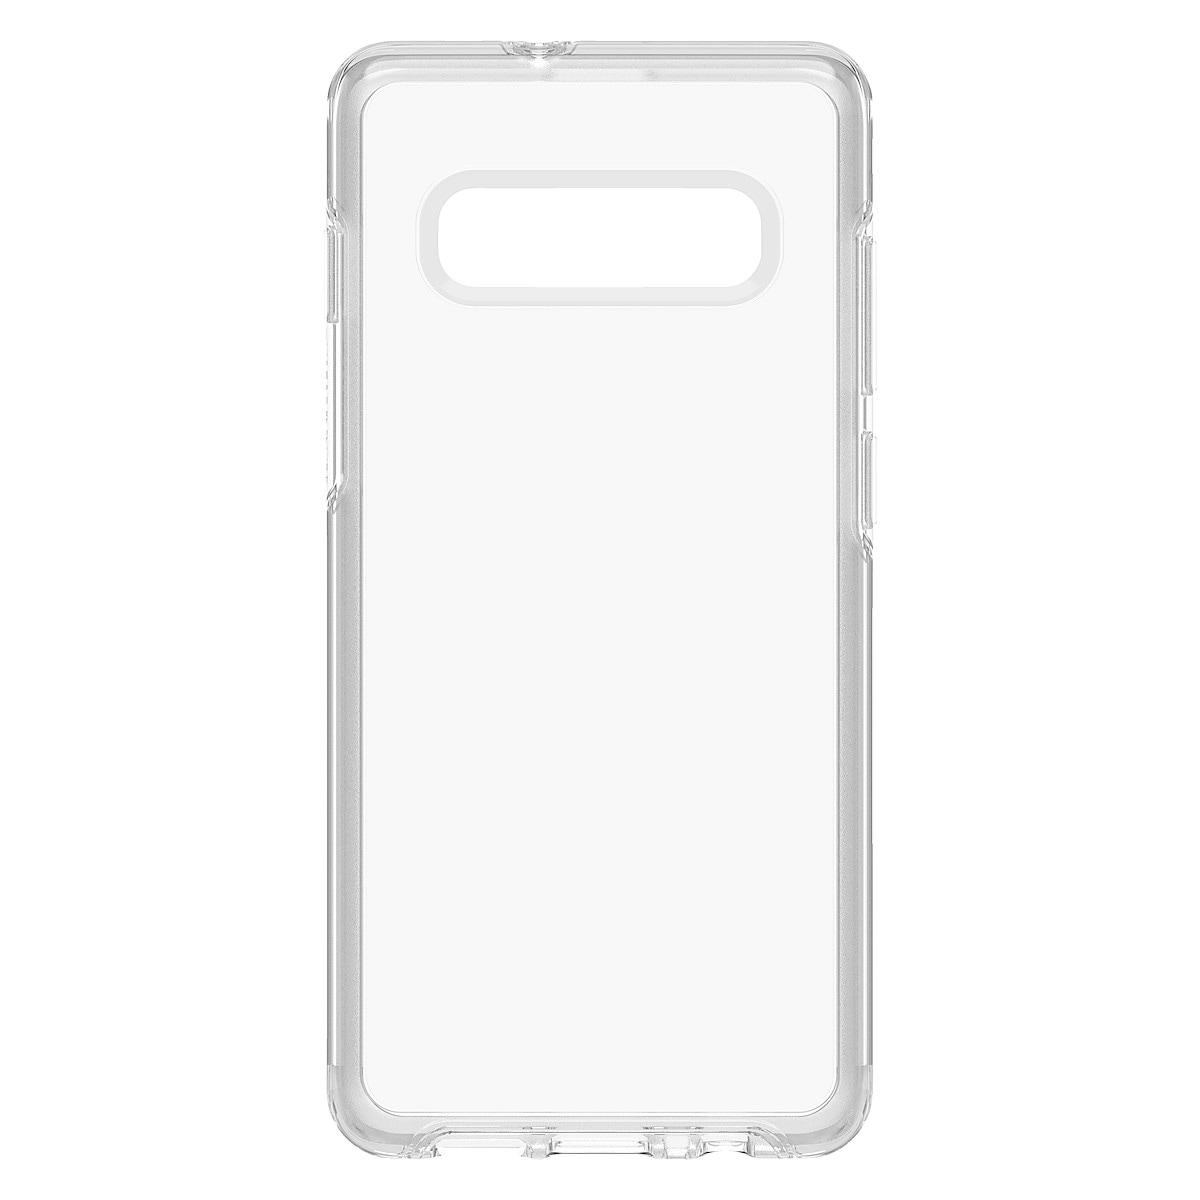 Skyddsskal för Samsung Galaxy S10+, Otterbox Symmetry Clear